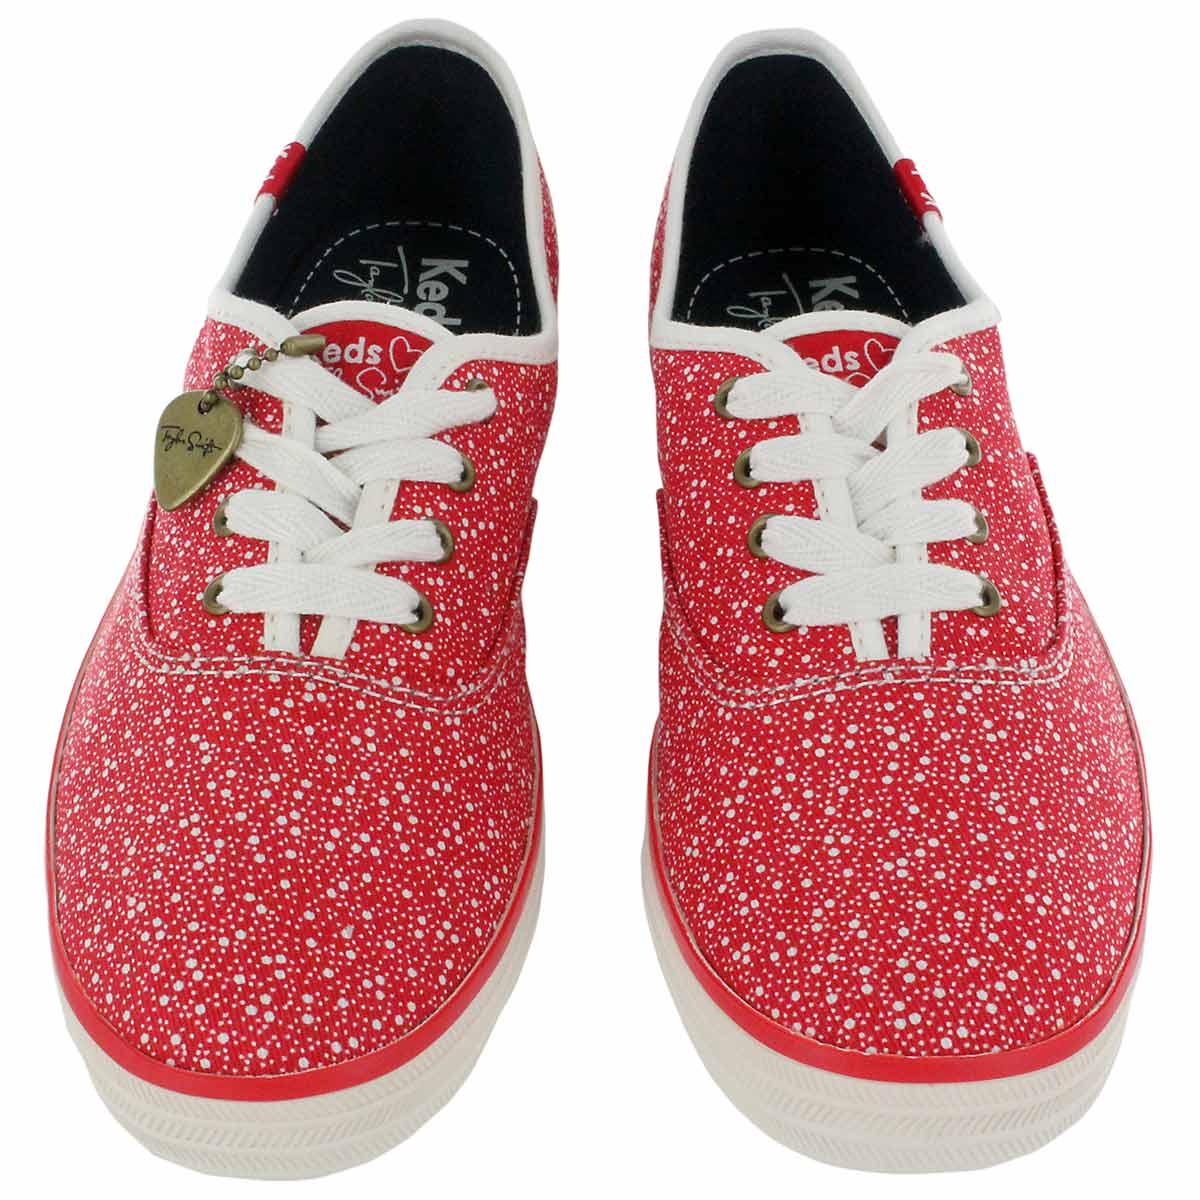 Zapatos Keds rojos